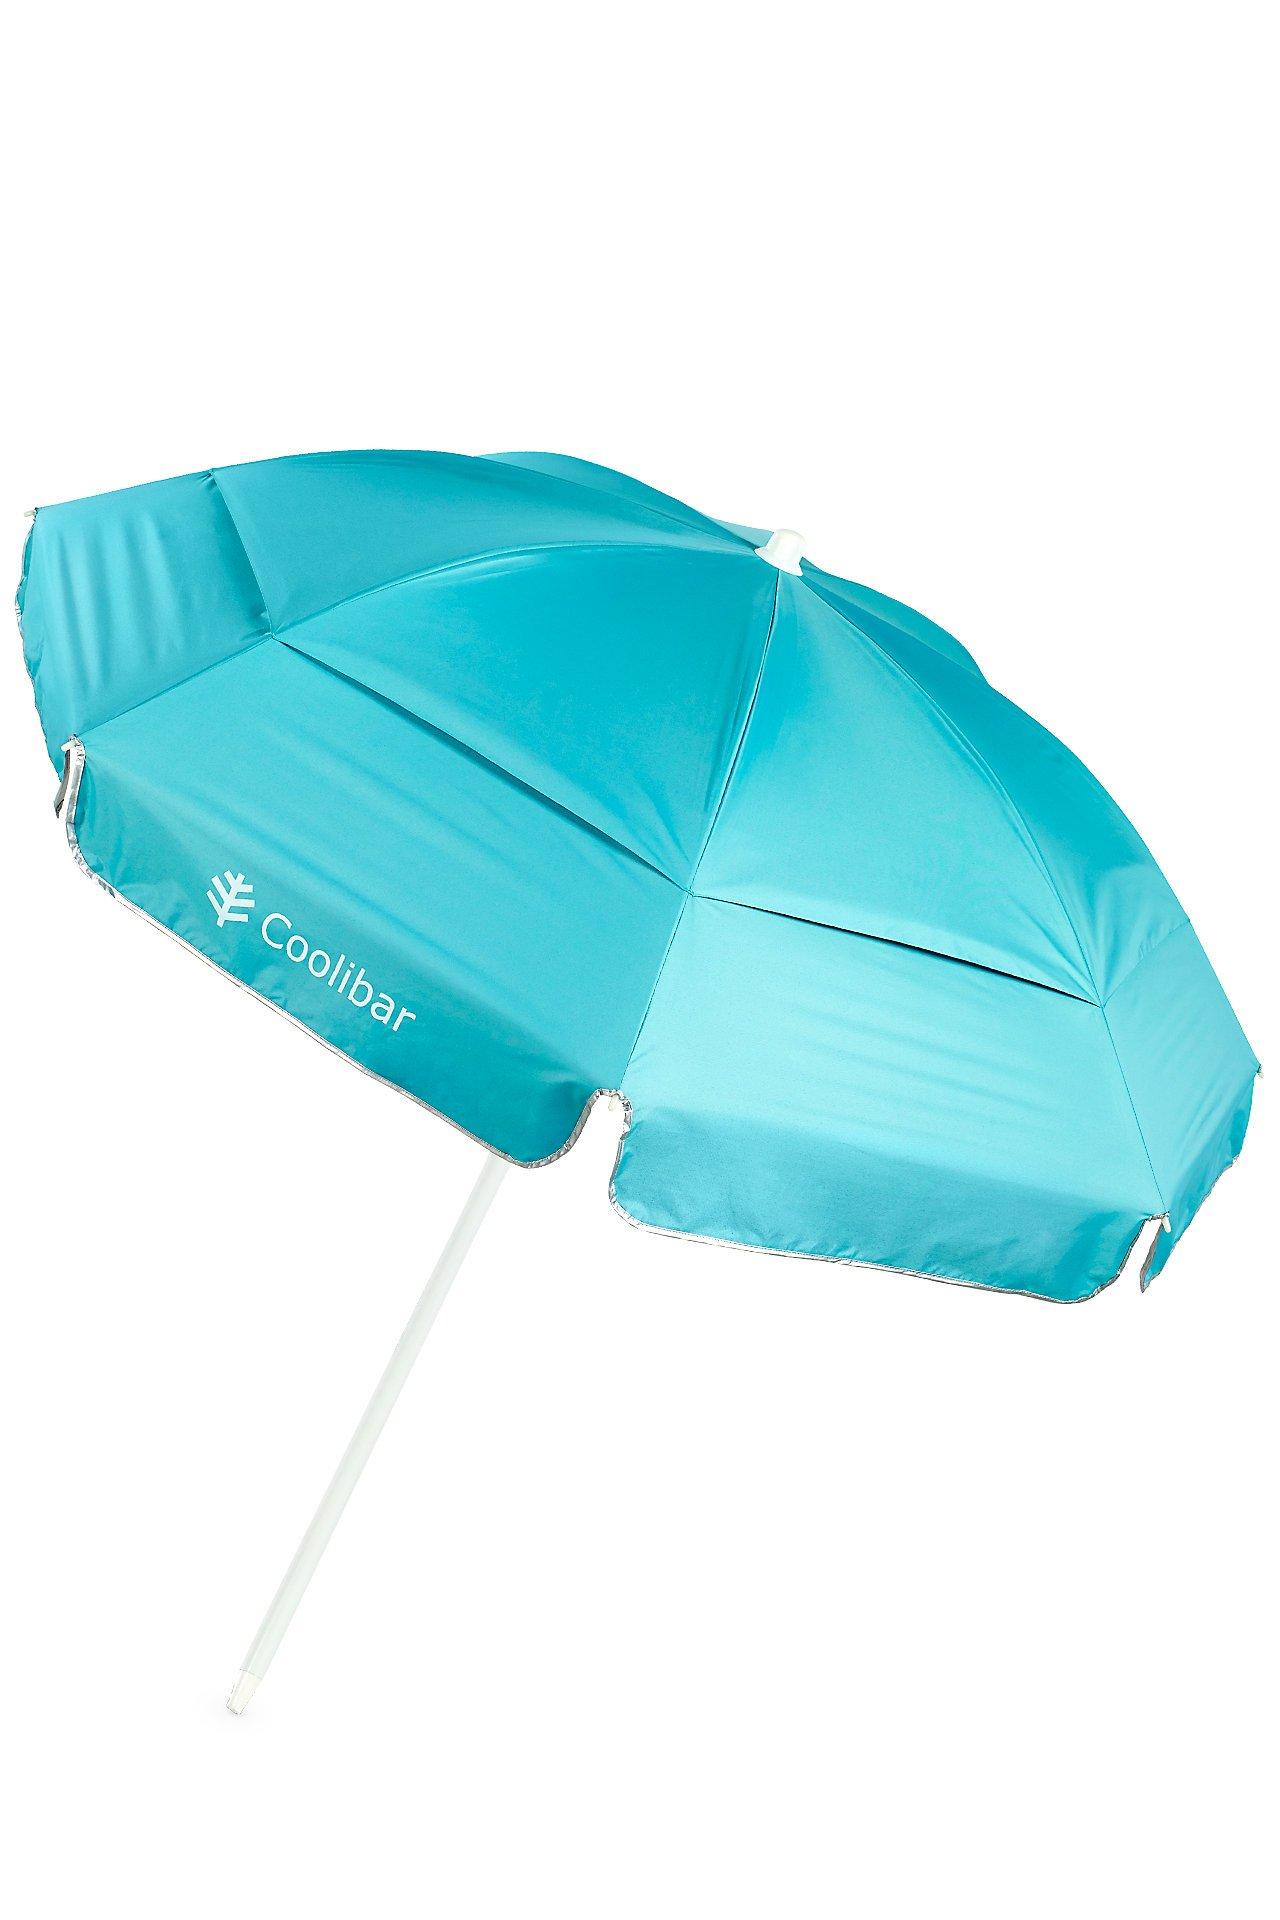 Coolibar UPF 50+ 6' Titanium Beach Umbrella - Sun Protective (One Size- Cooliblue)